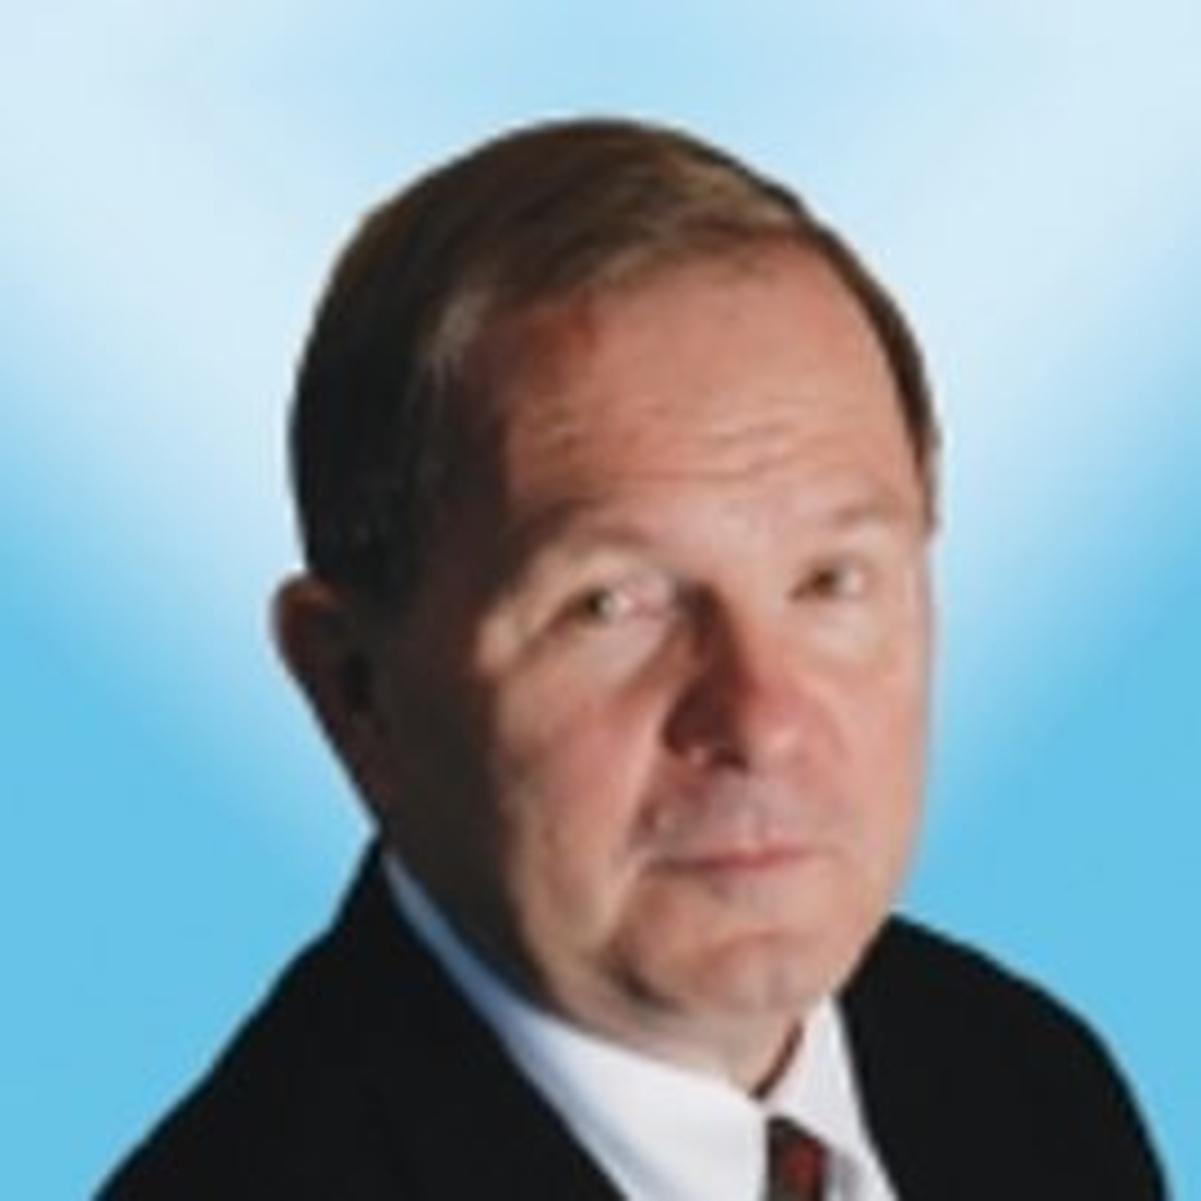 William B. Scheessele